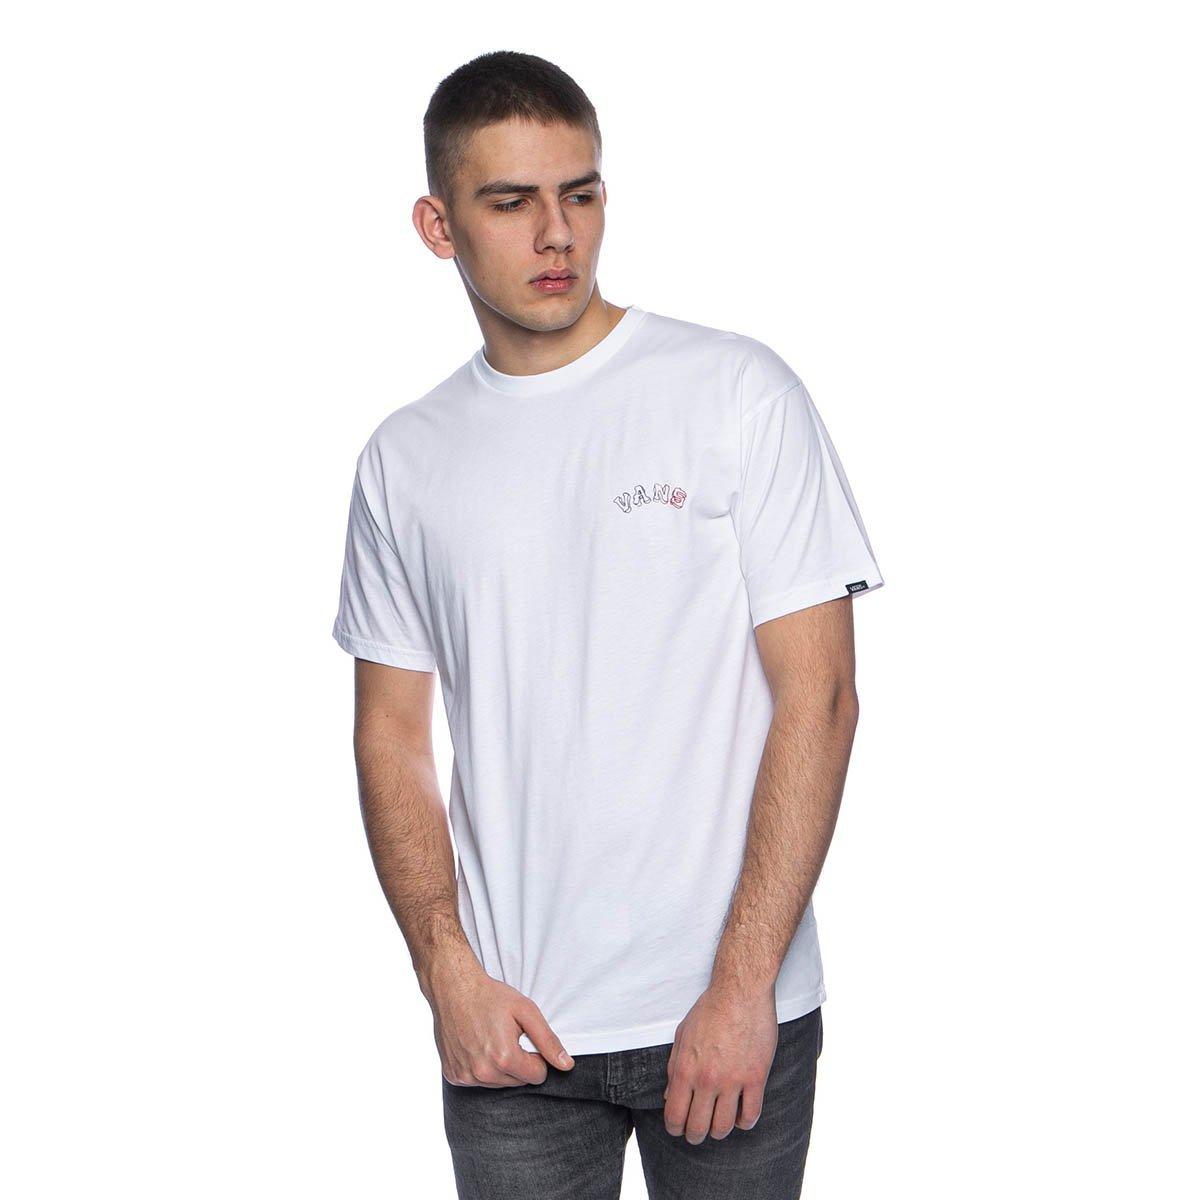 Koszulka Vans Tres Culebras T shirt white